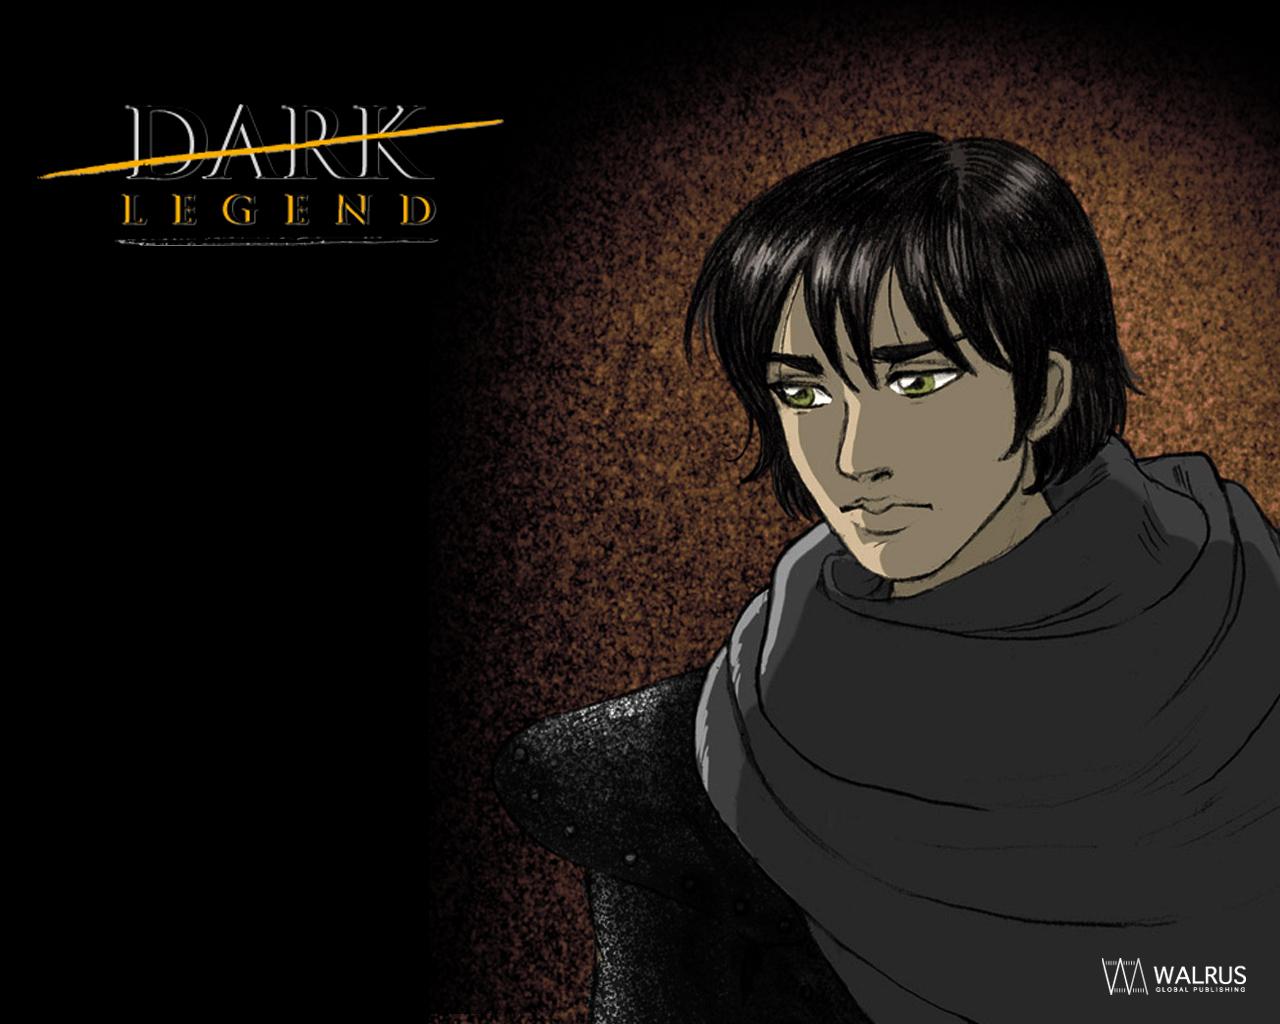 Dark Legend (fuente: Editorial Walrus)